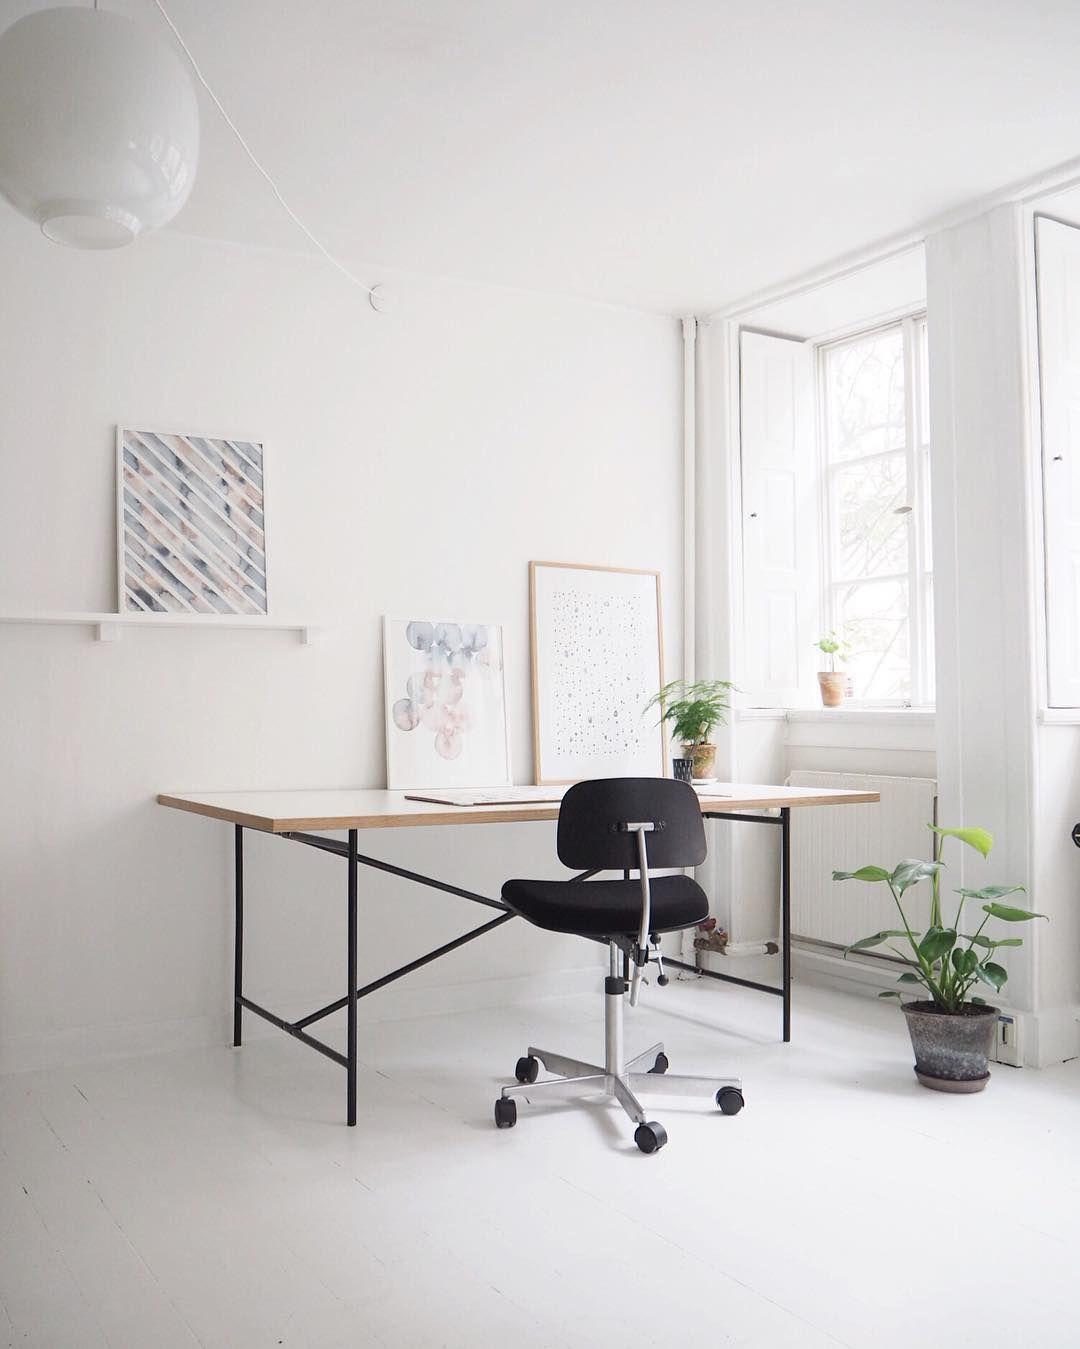 workspace furniture office interior corner office desk. Workspace: Studio Artwork By At{Silke Bonde} Workspace Furniture Office Interior Corner Desk 8